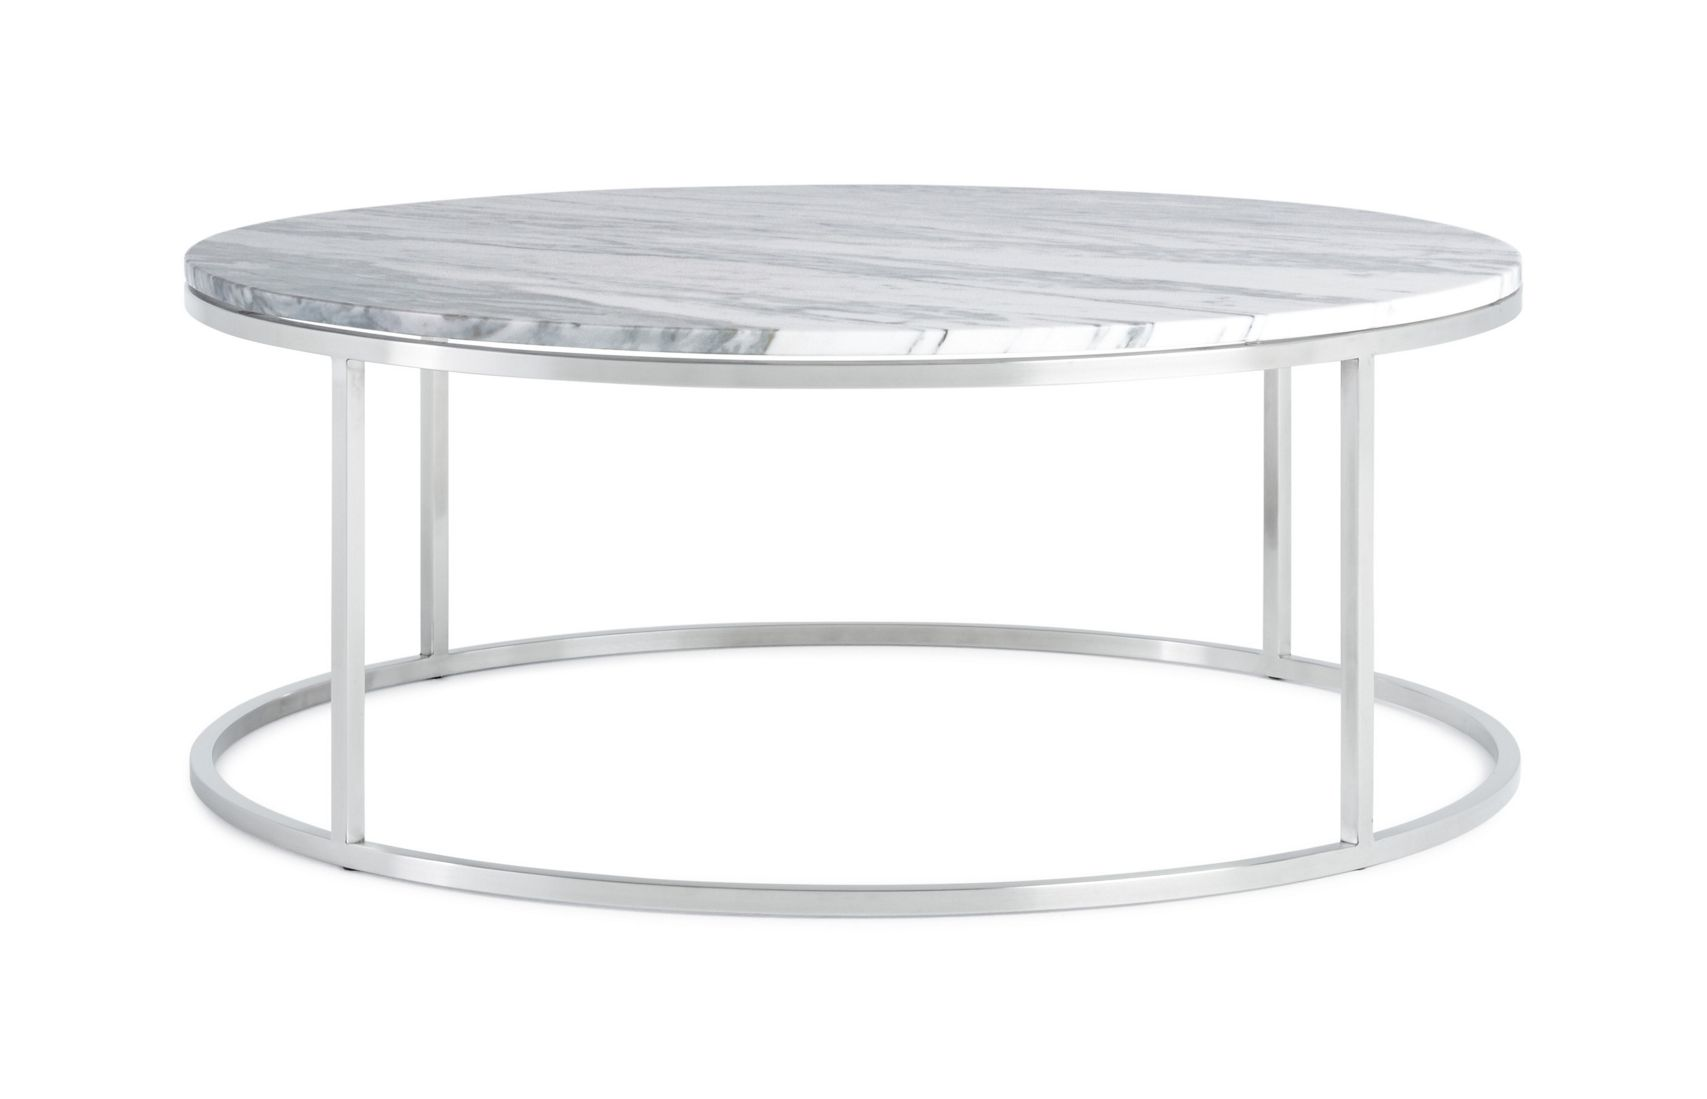 Saarinen Coffee Table Round Rubik Round Coffee Table